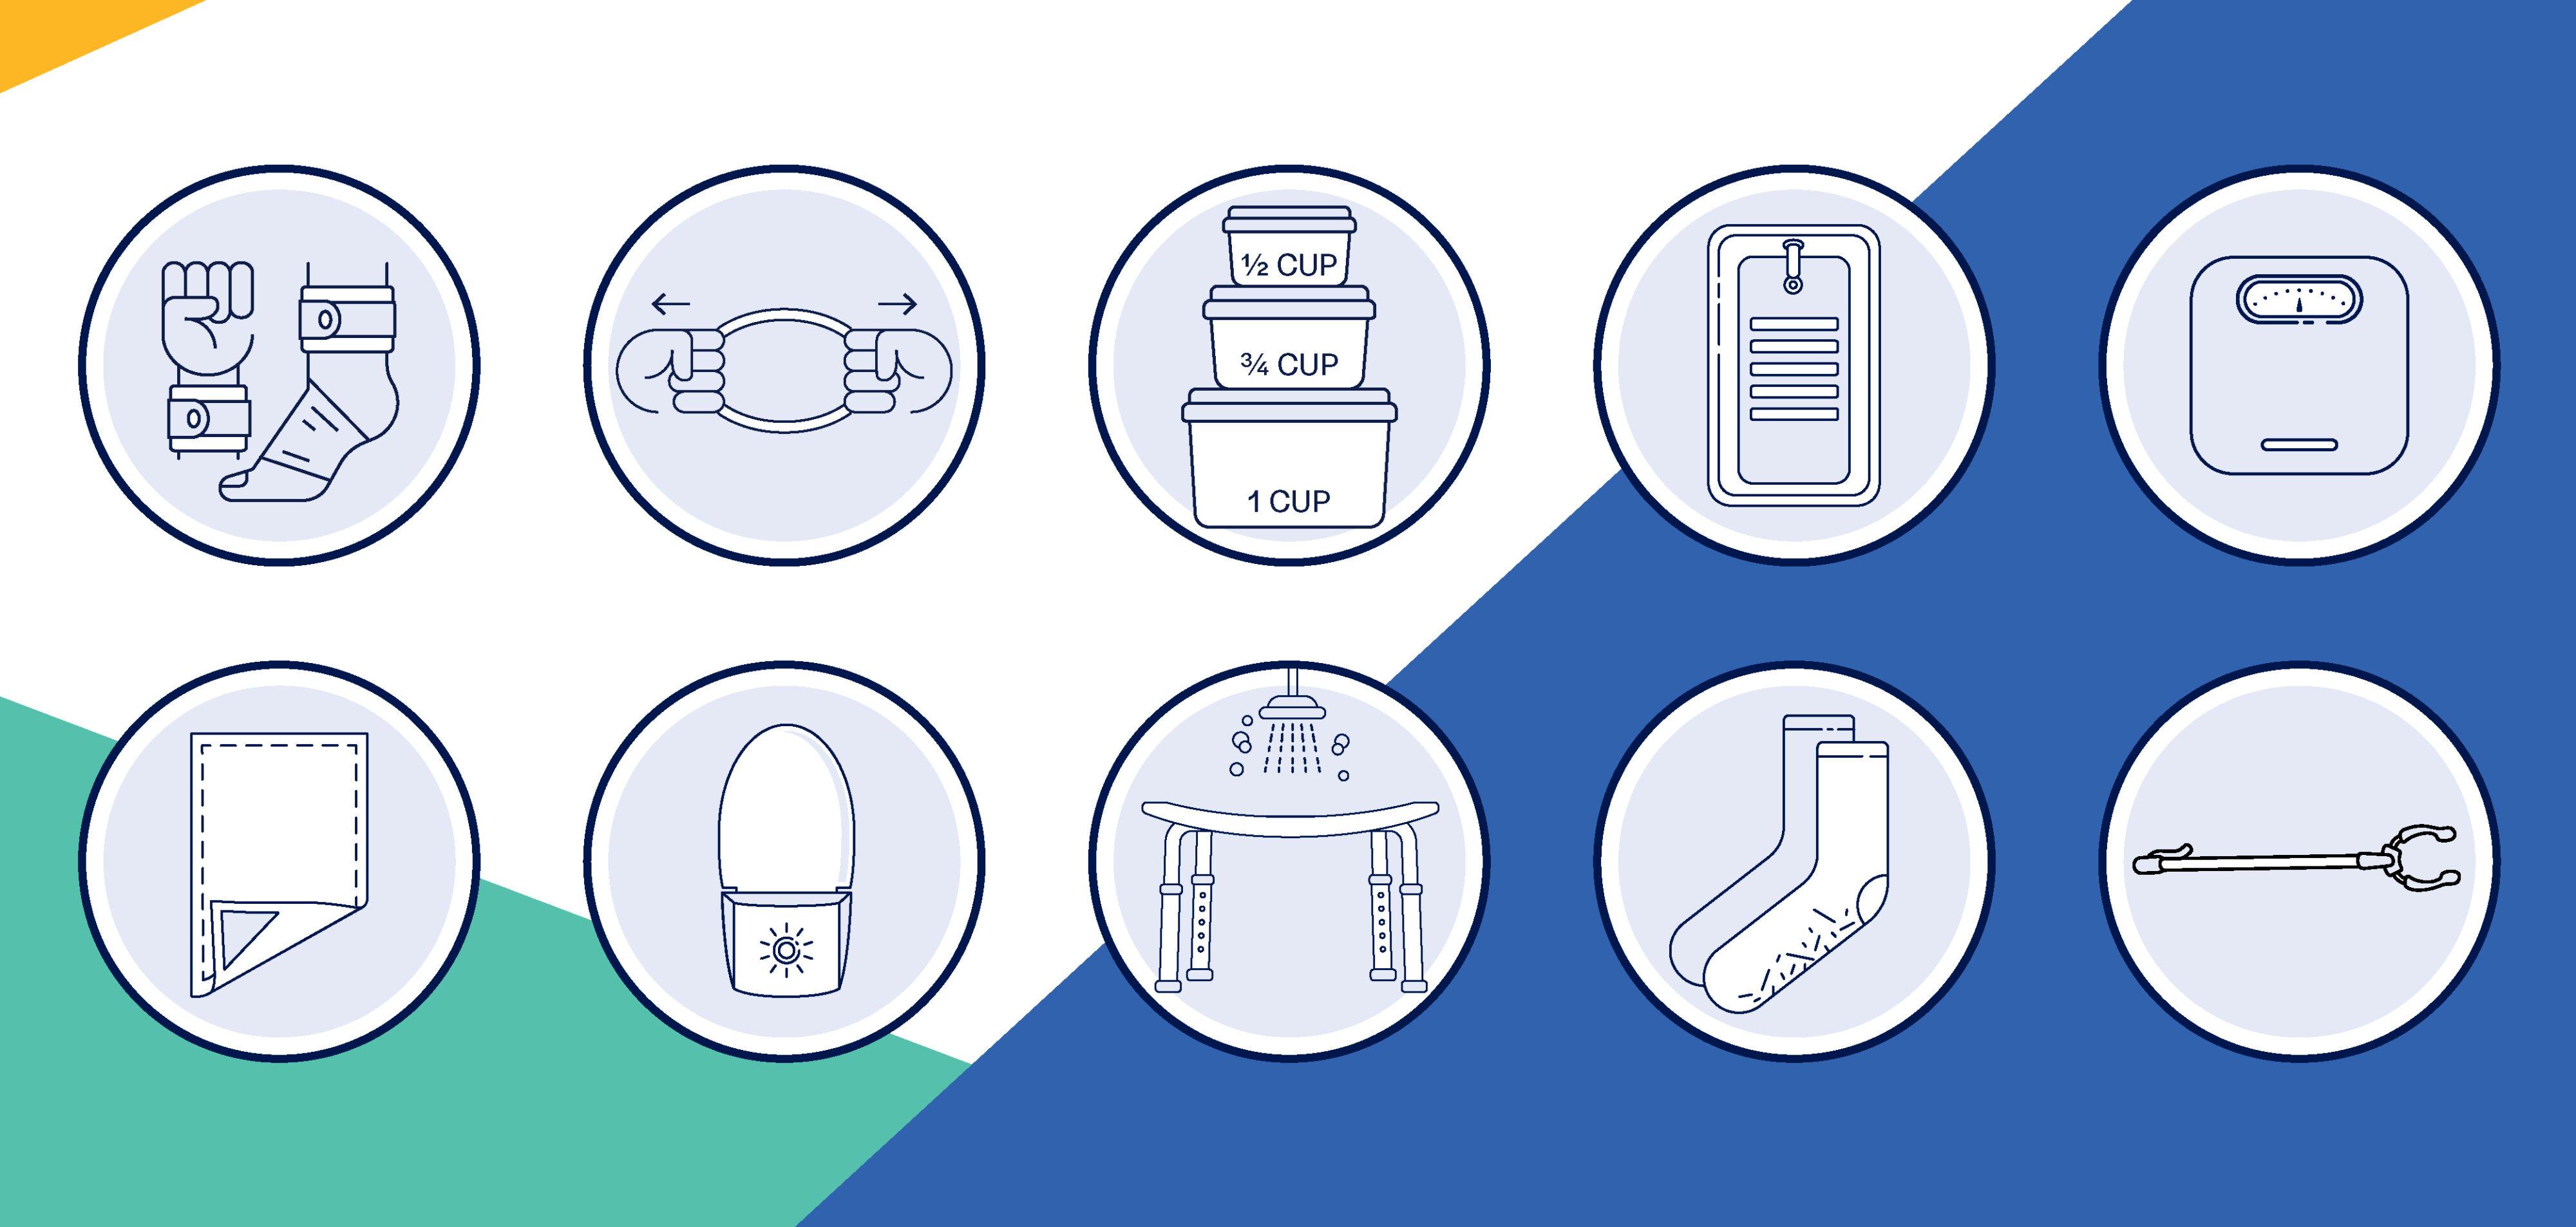 Medline Ready Sets Kit Icons